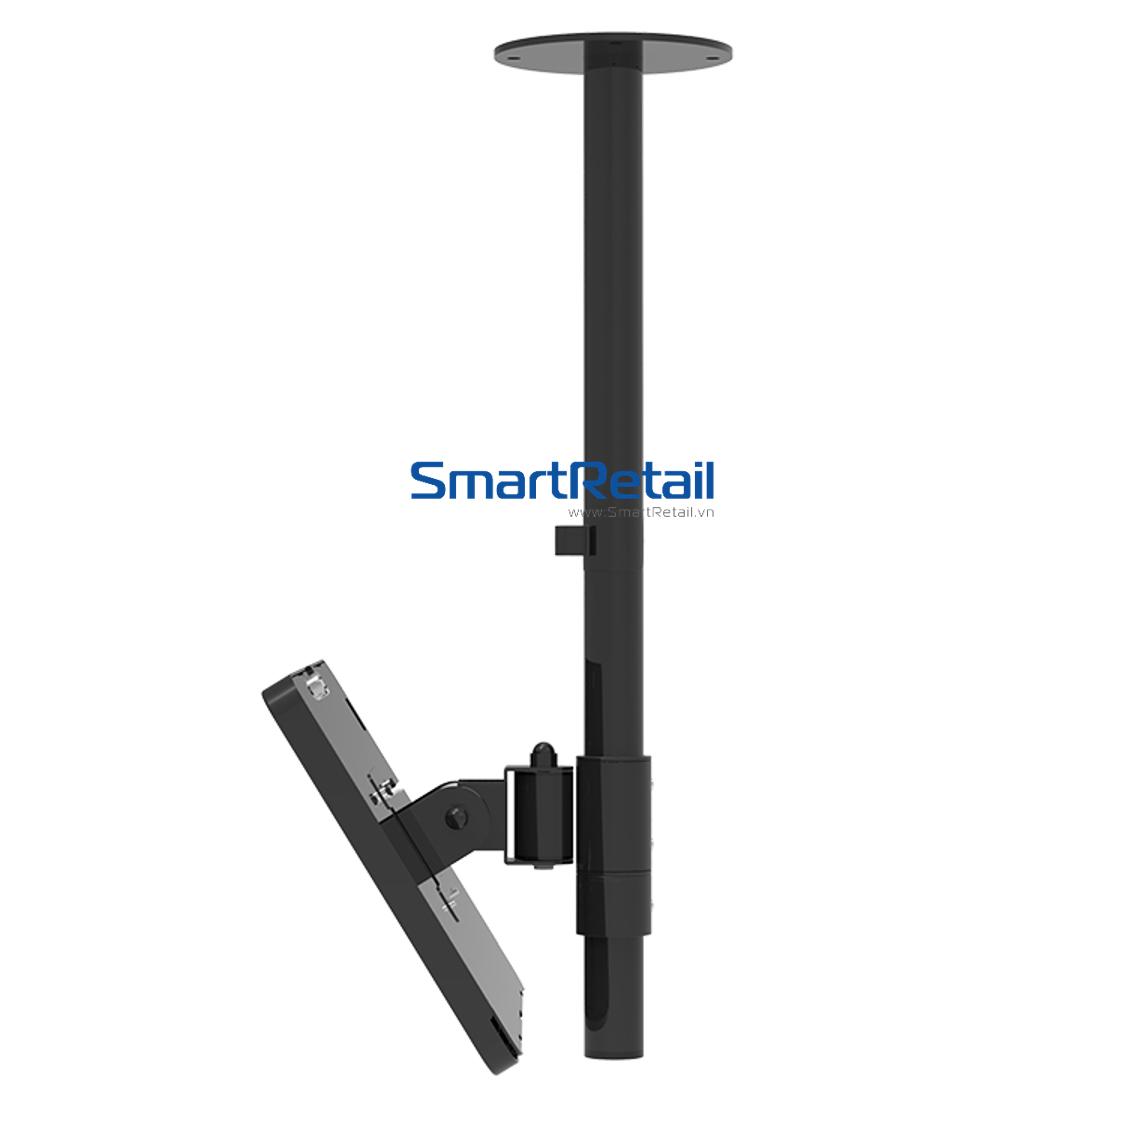 SmartRetail Thiet bi bao ve Tablet 4